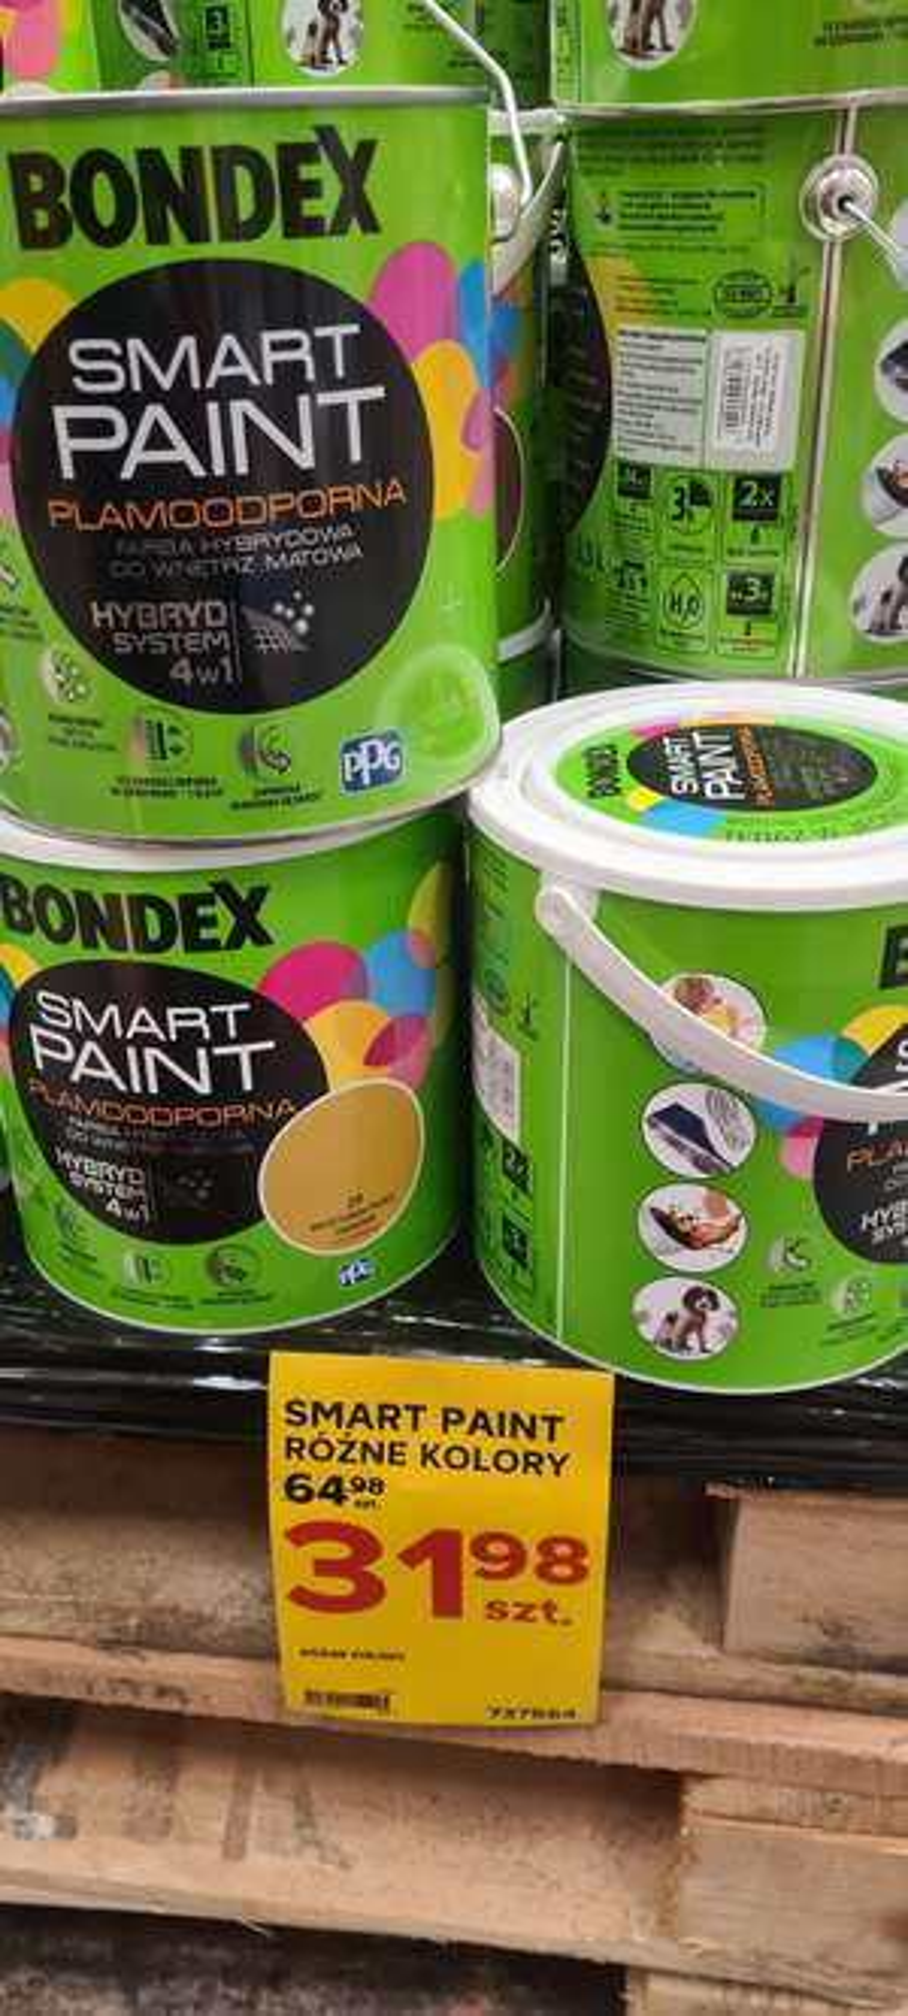 Bondex farba smart paint plamoodporna